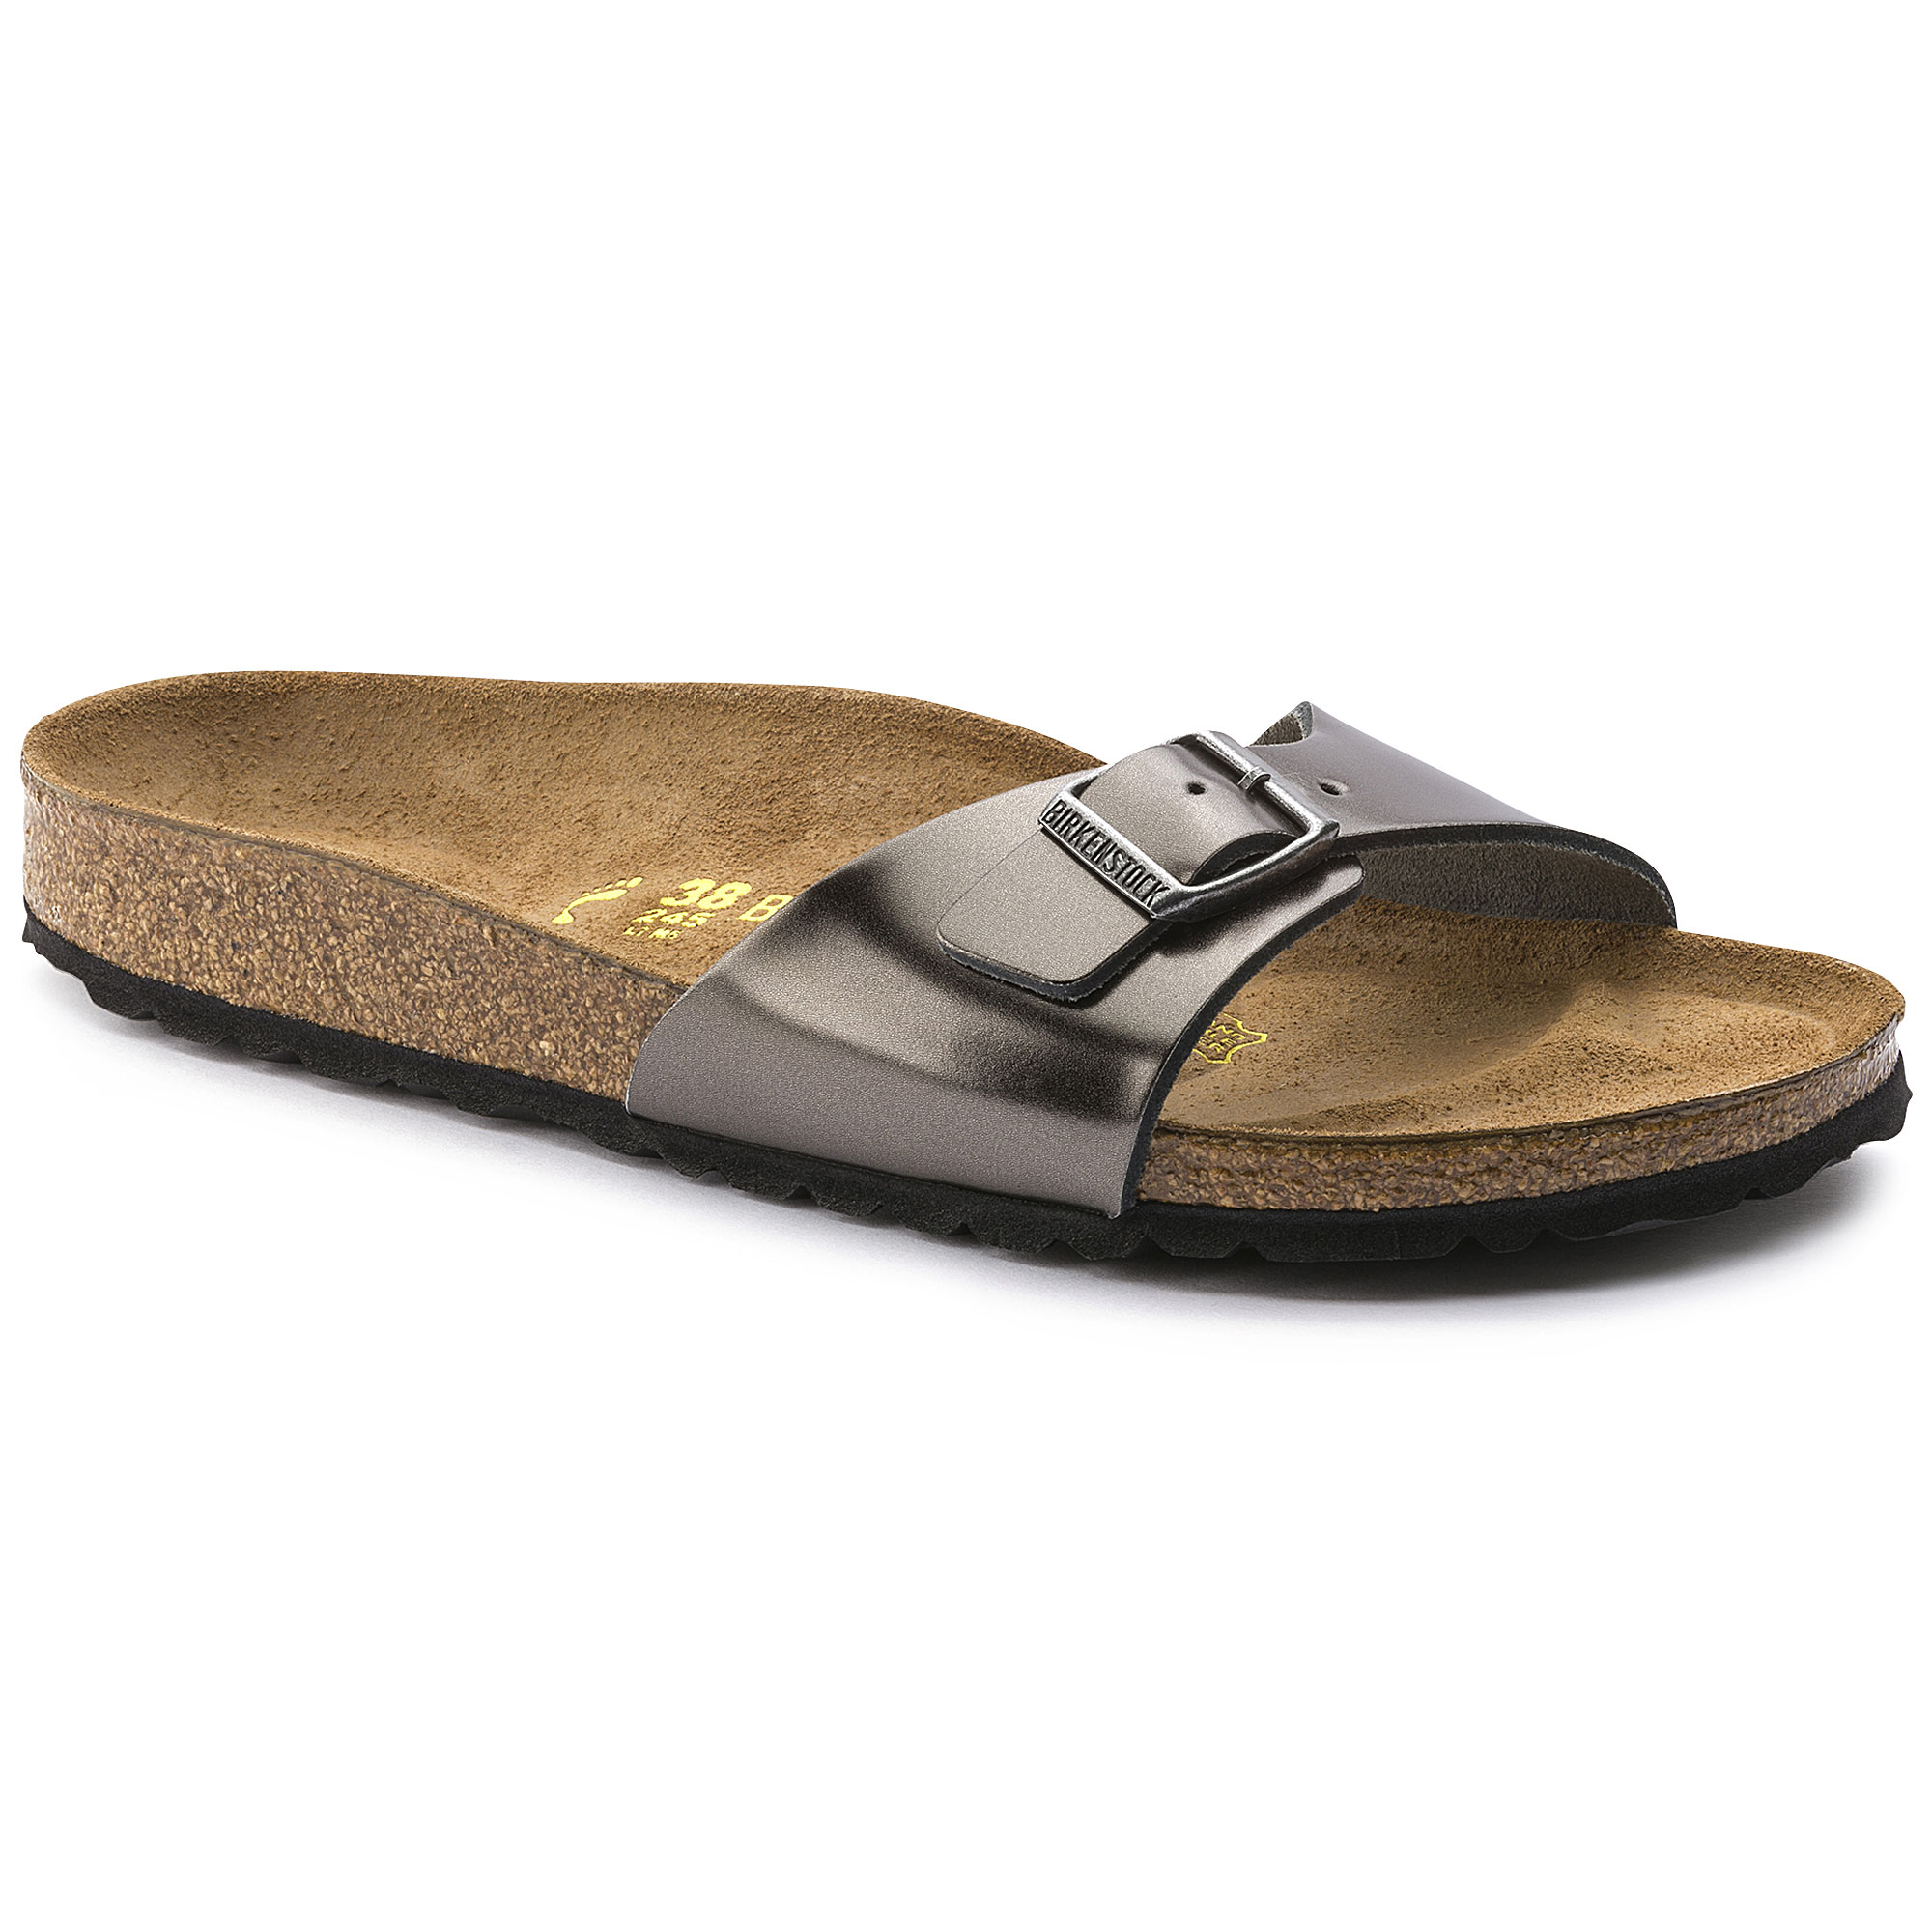 sports shoes 35625 fe2fa Madrid Leather Metallic Anthracite